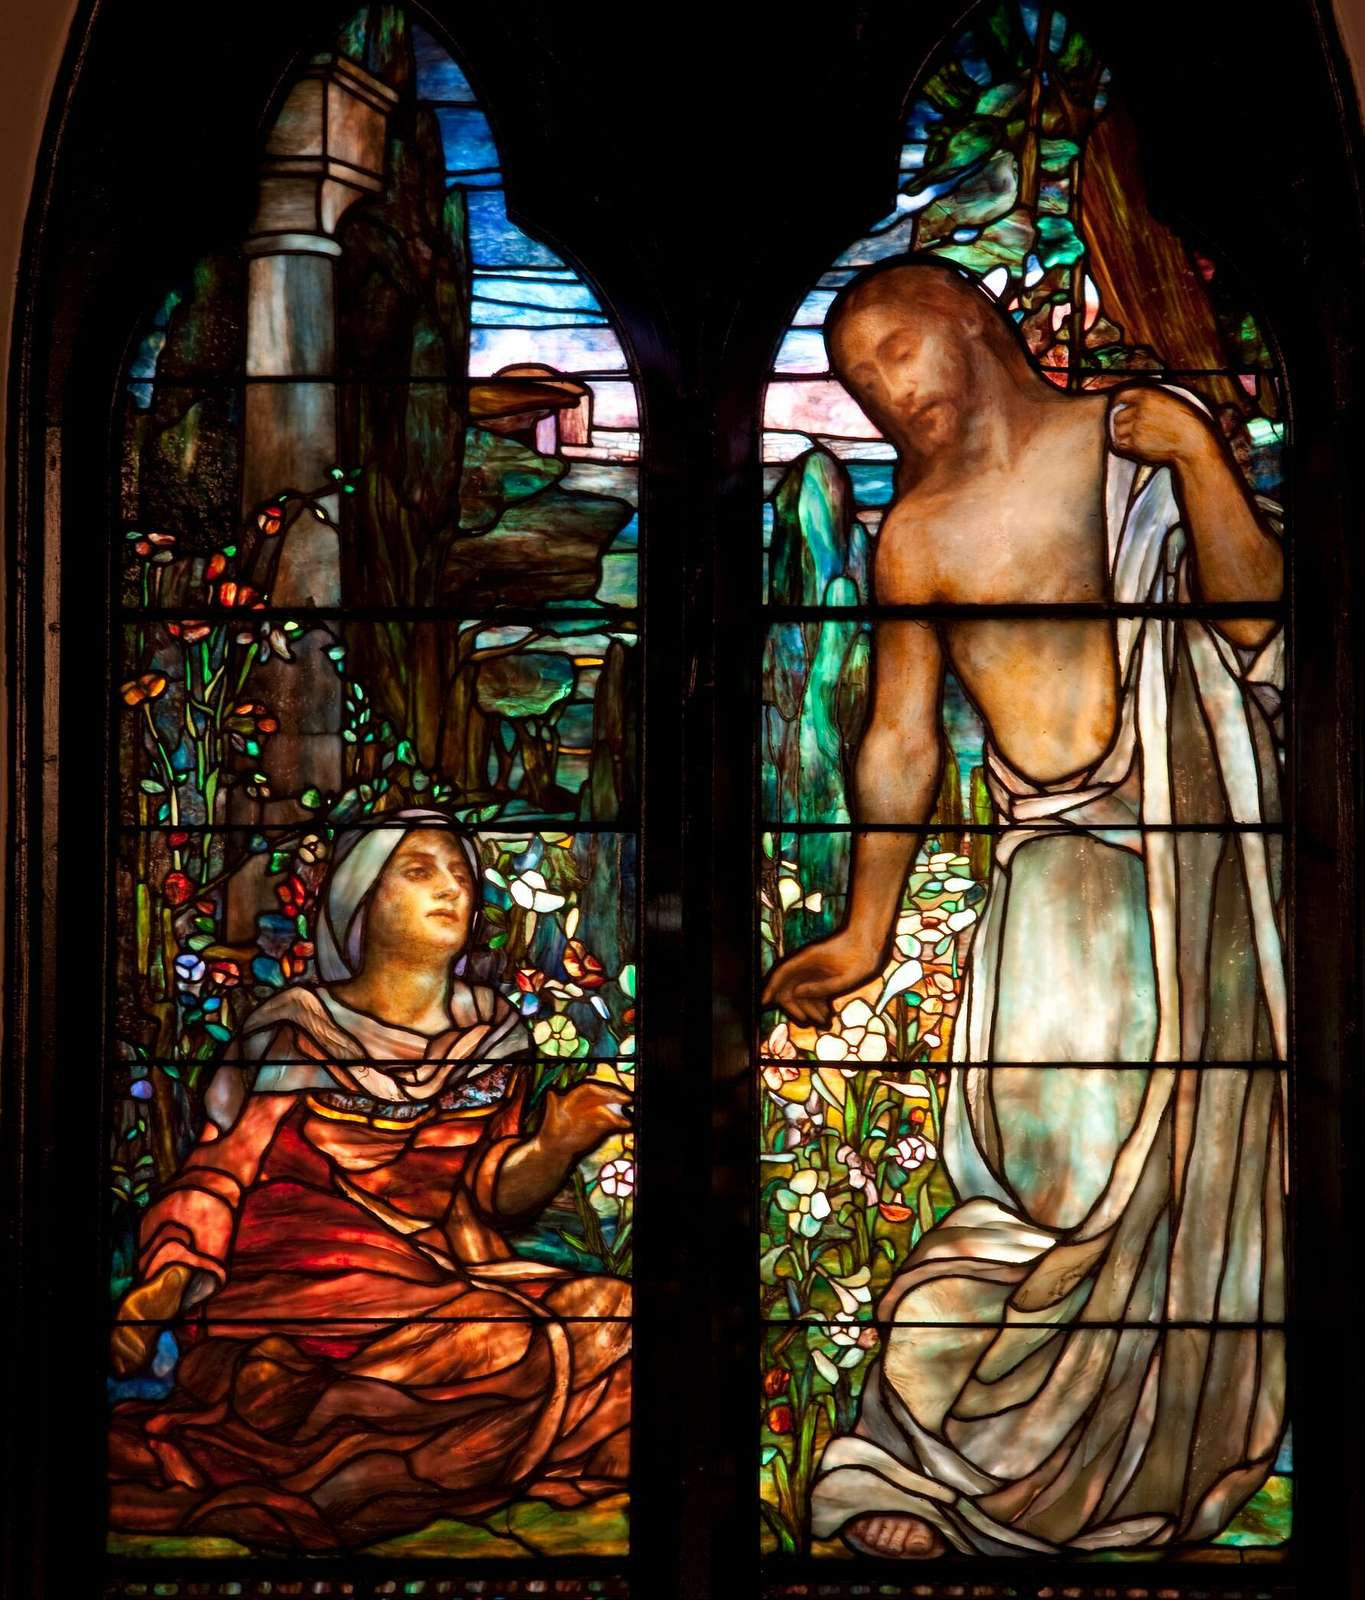 Tiffany stained glass windows, St. Paul's Episcopal Church, Selma, Alabama